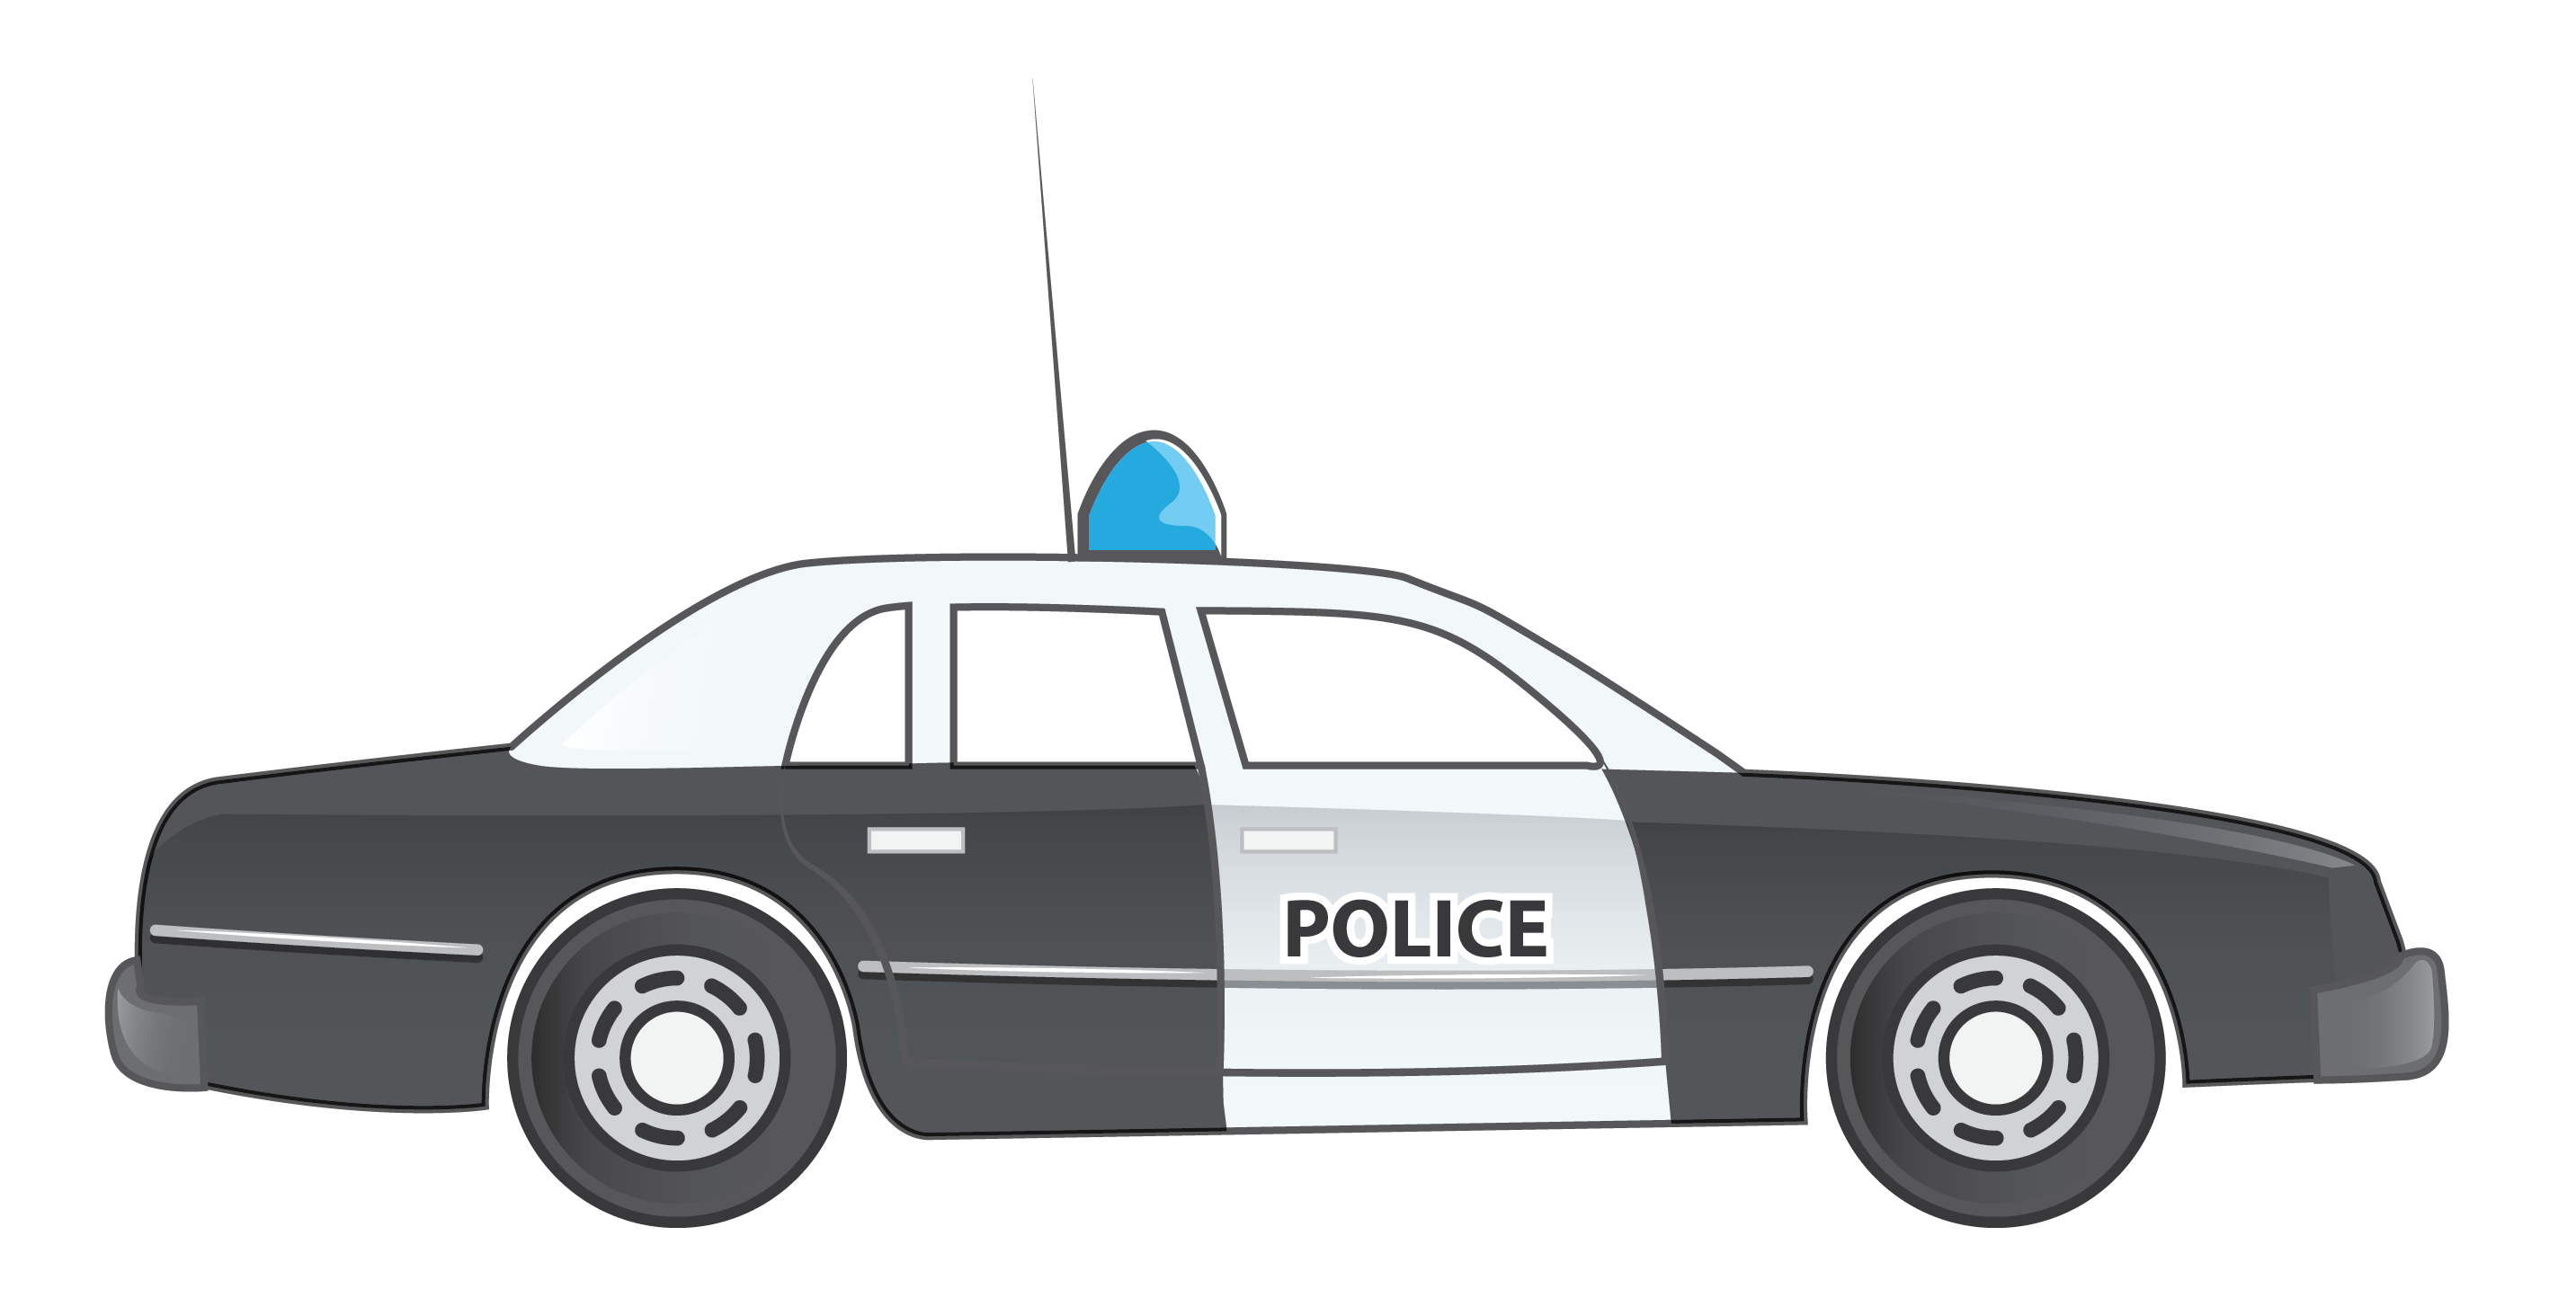 Free Police Car Clip Art-Free Police Car Clip Art-8